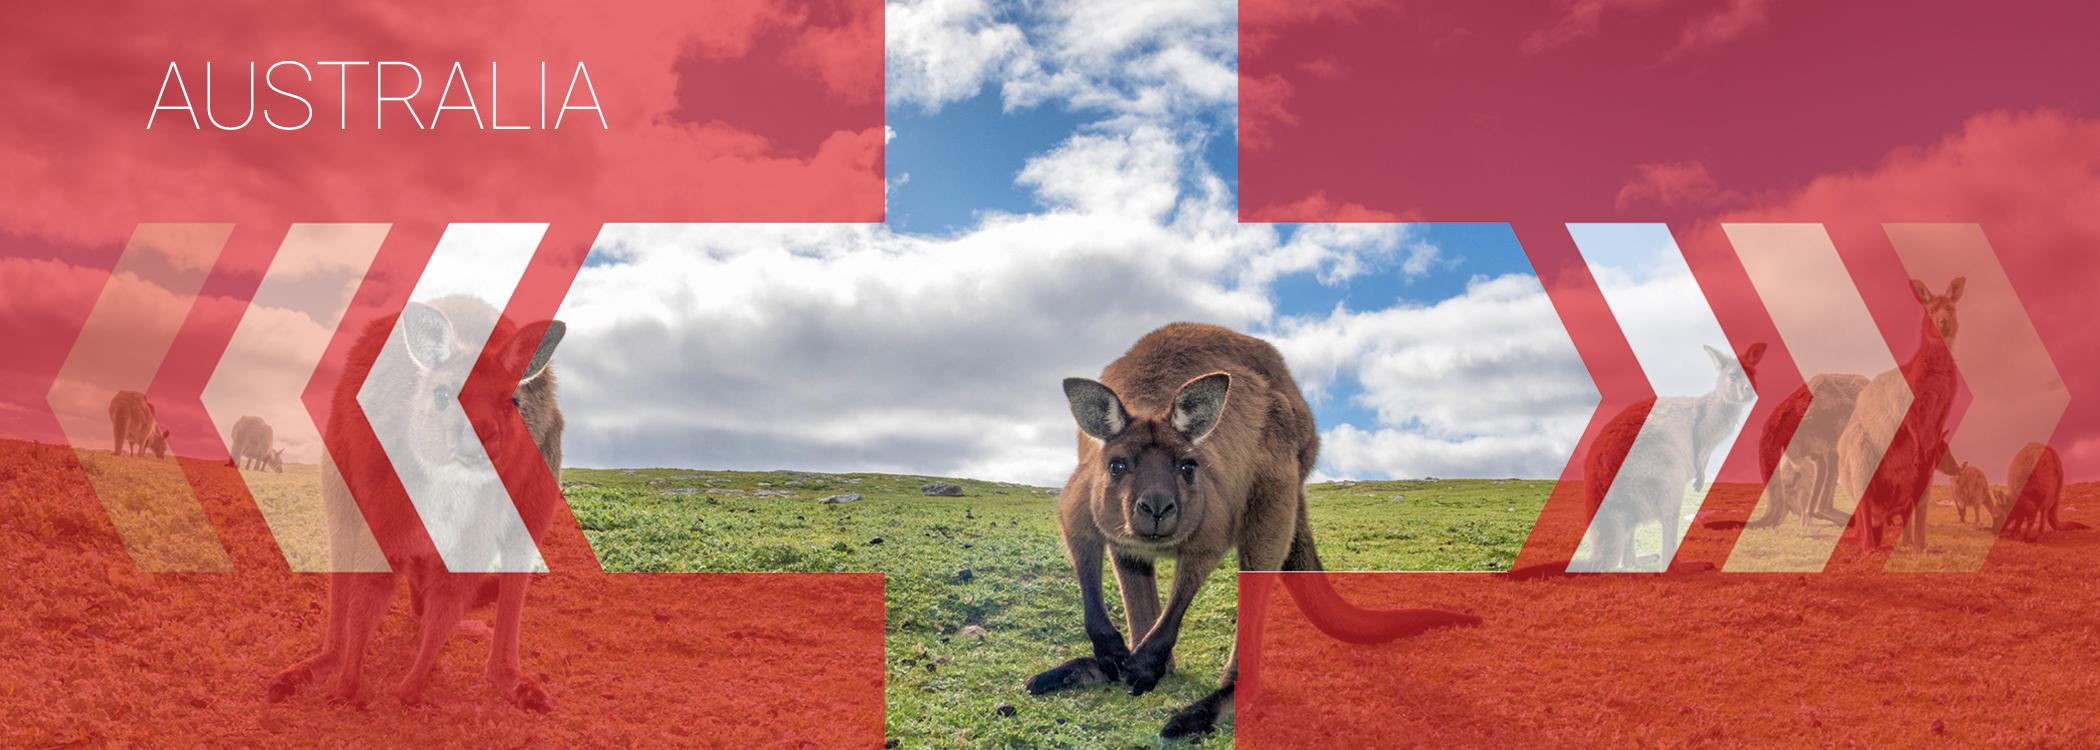 australia updated.jpg